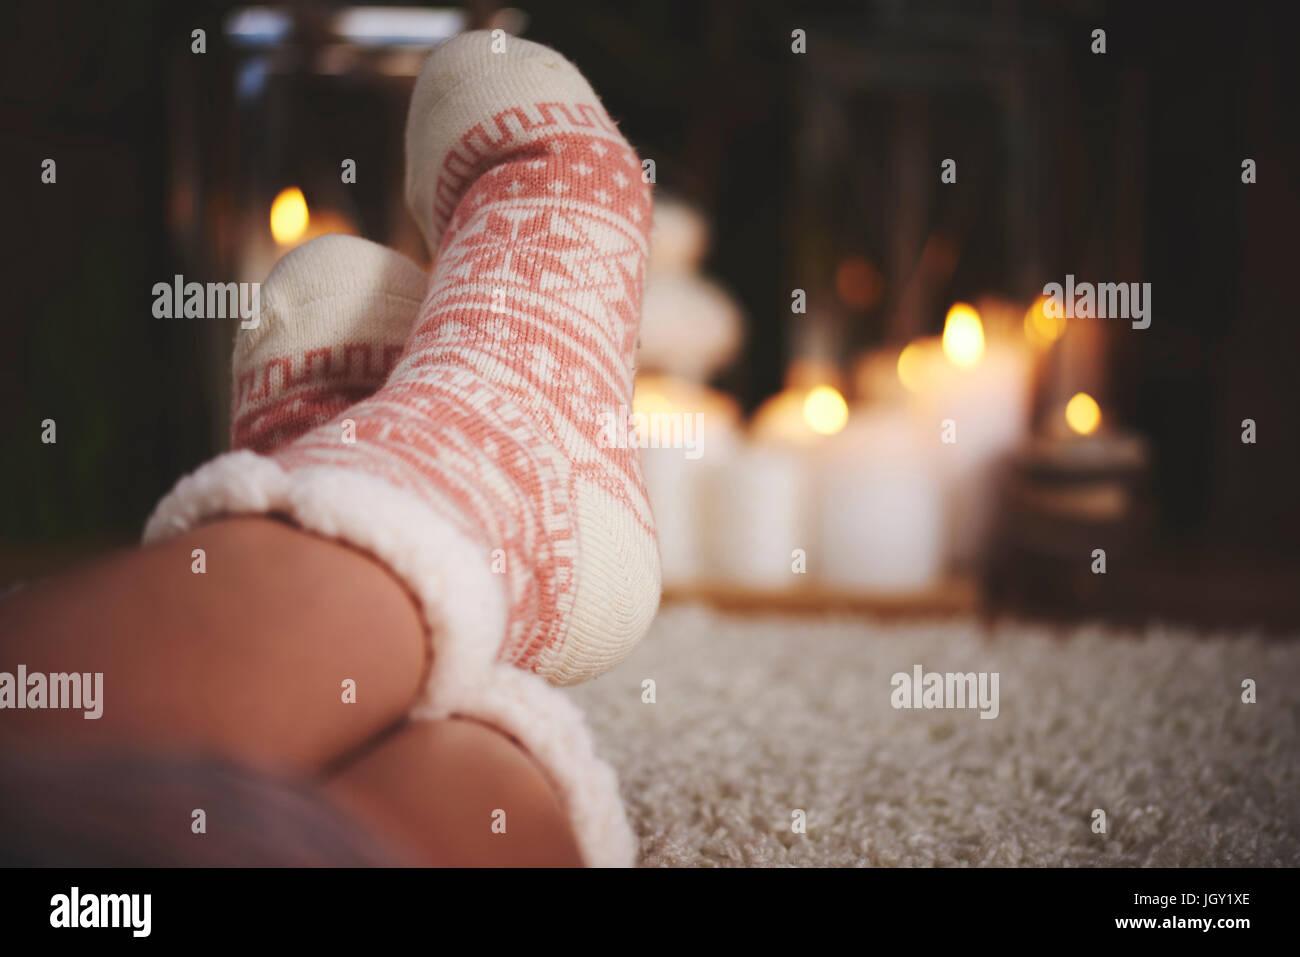 Piedi di donna di indossare calze di festa Immagini Stock